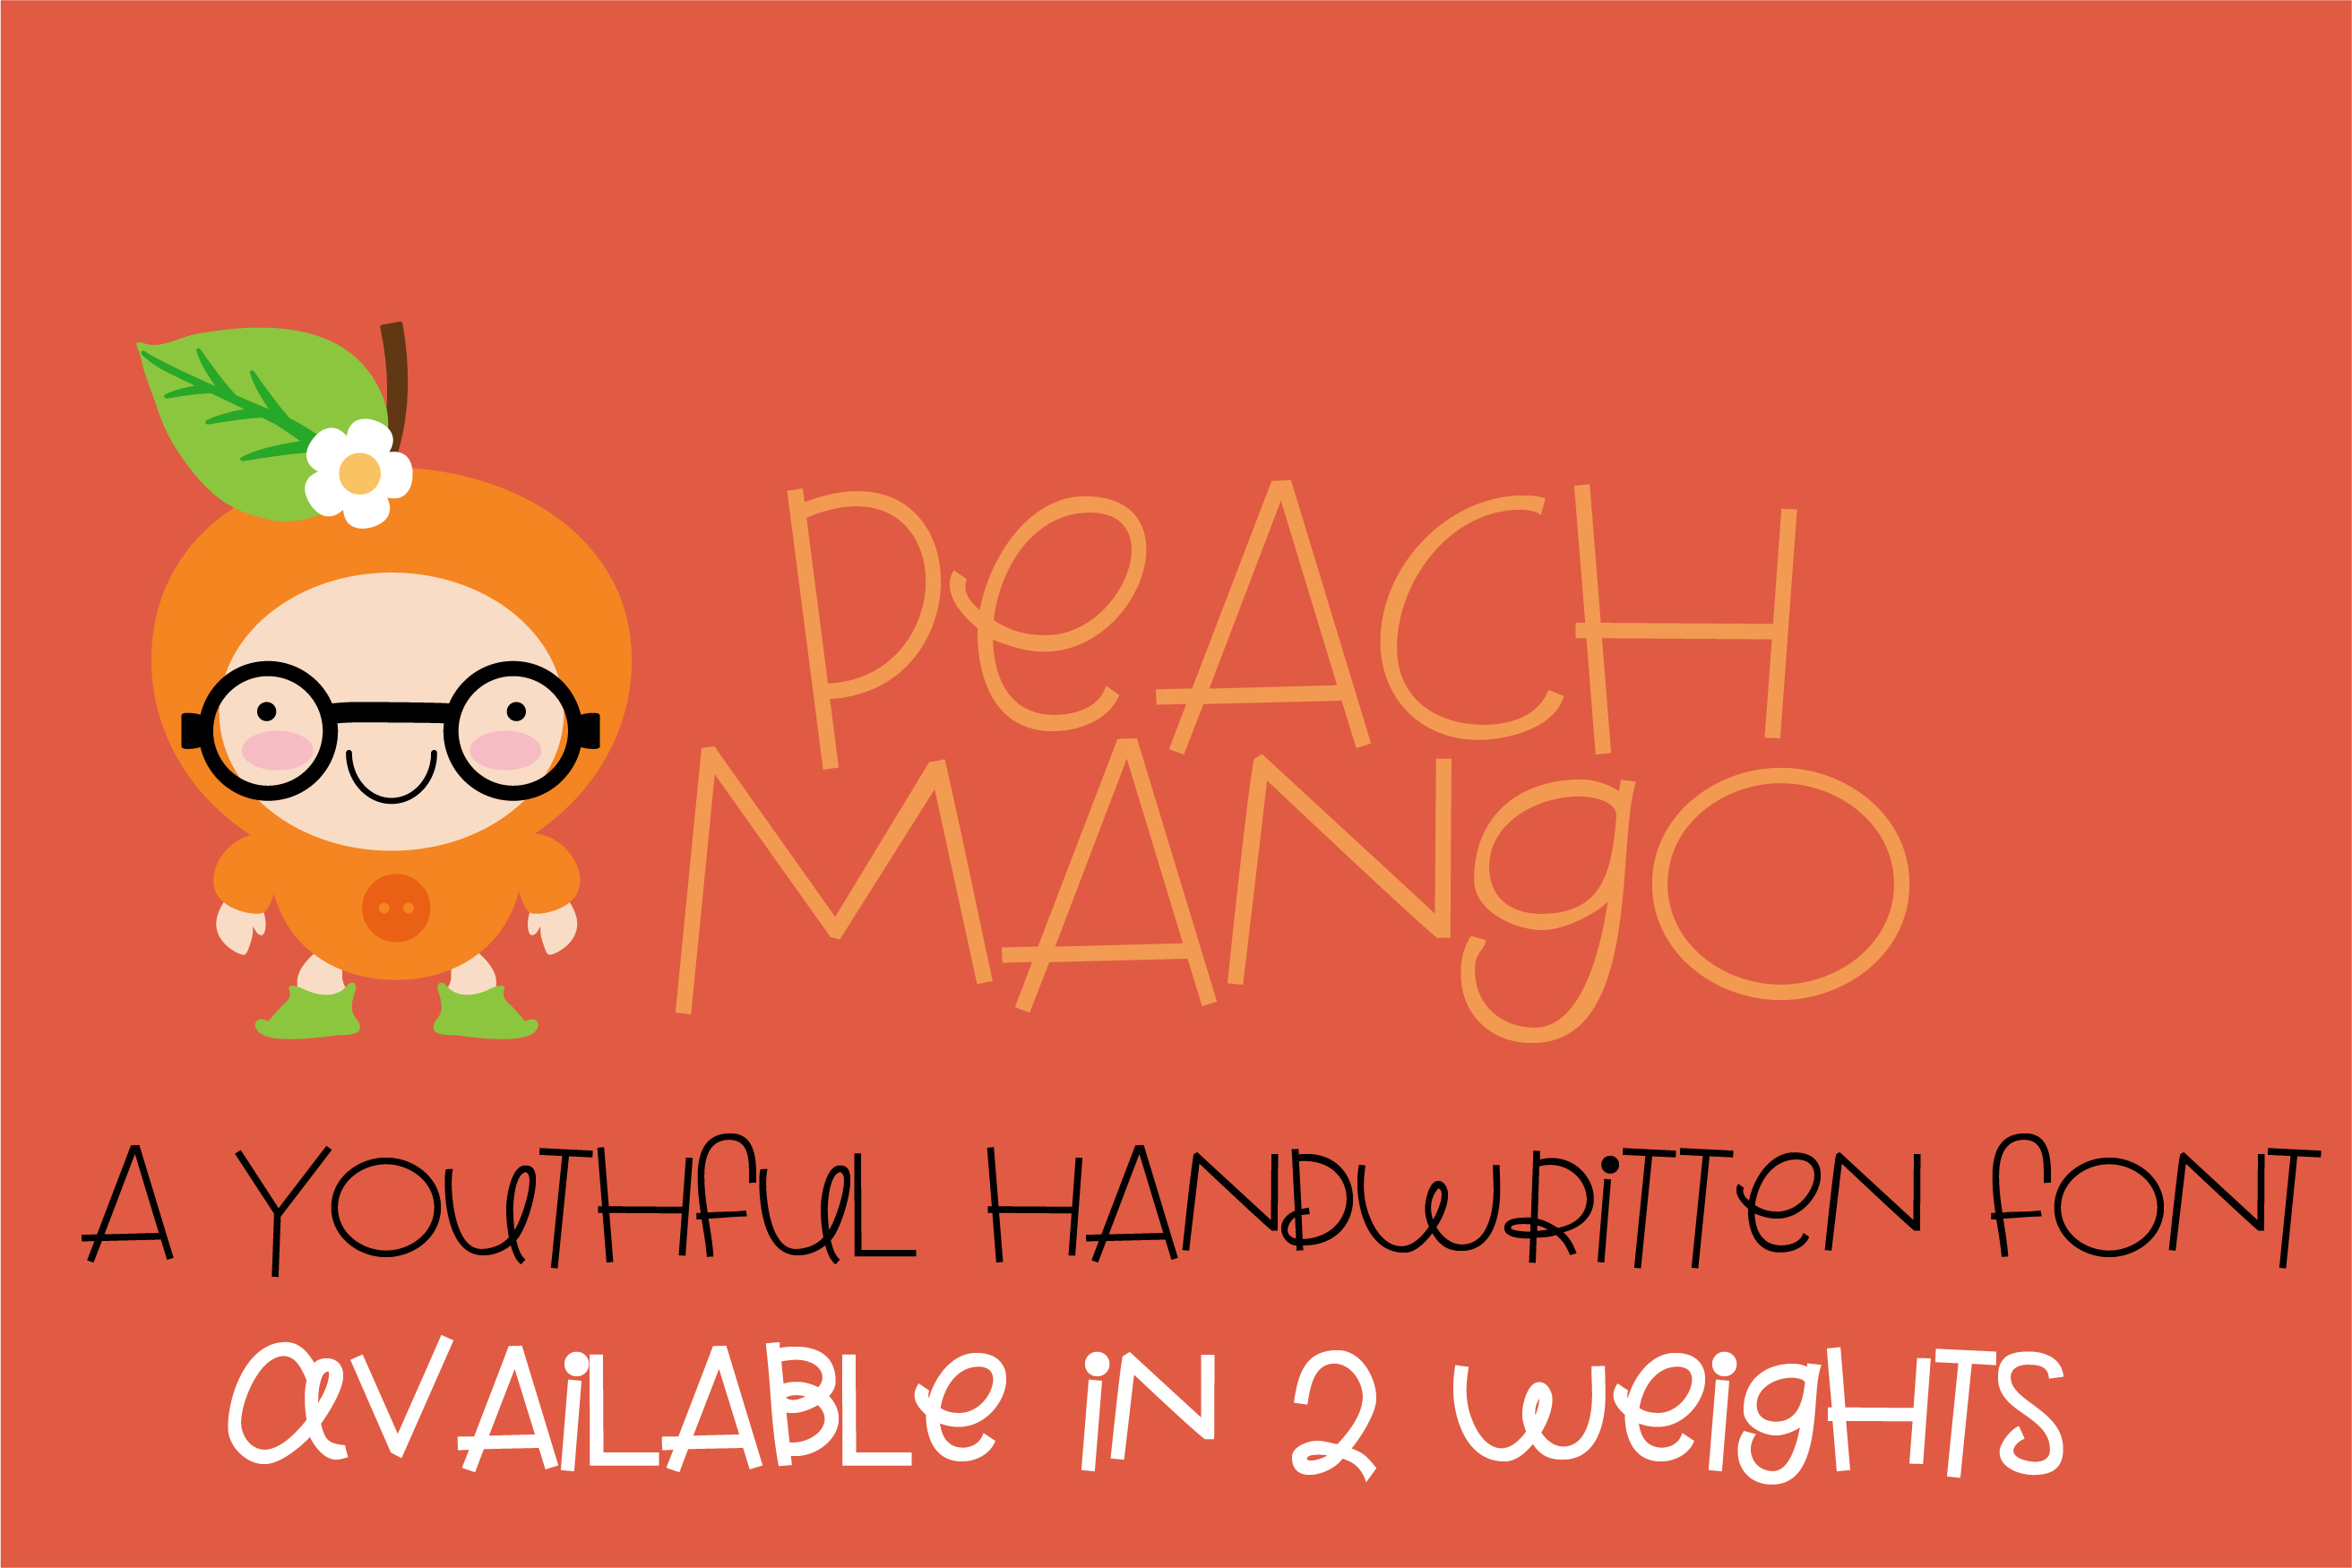 PN Peach Mango example image 1